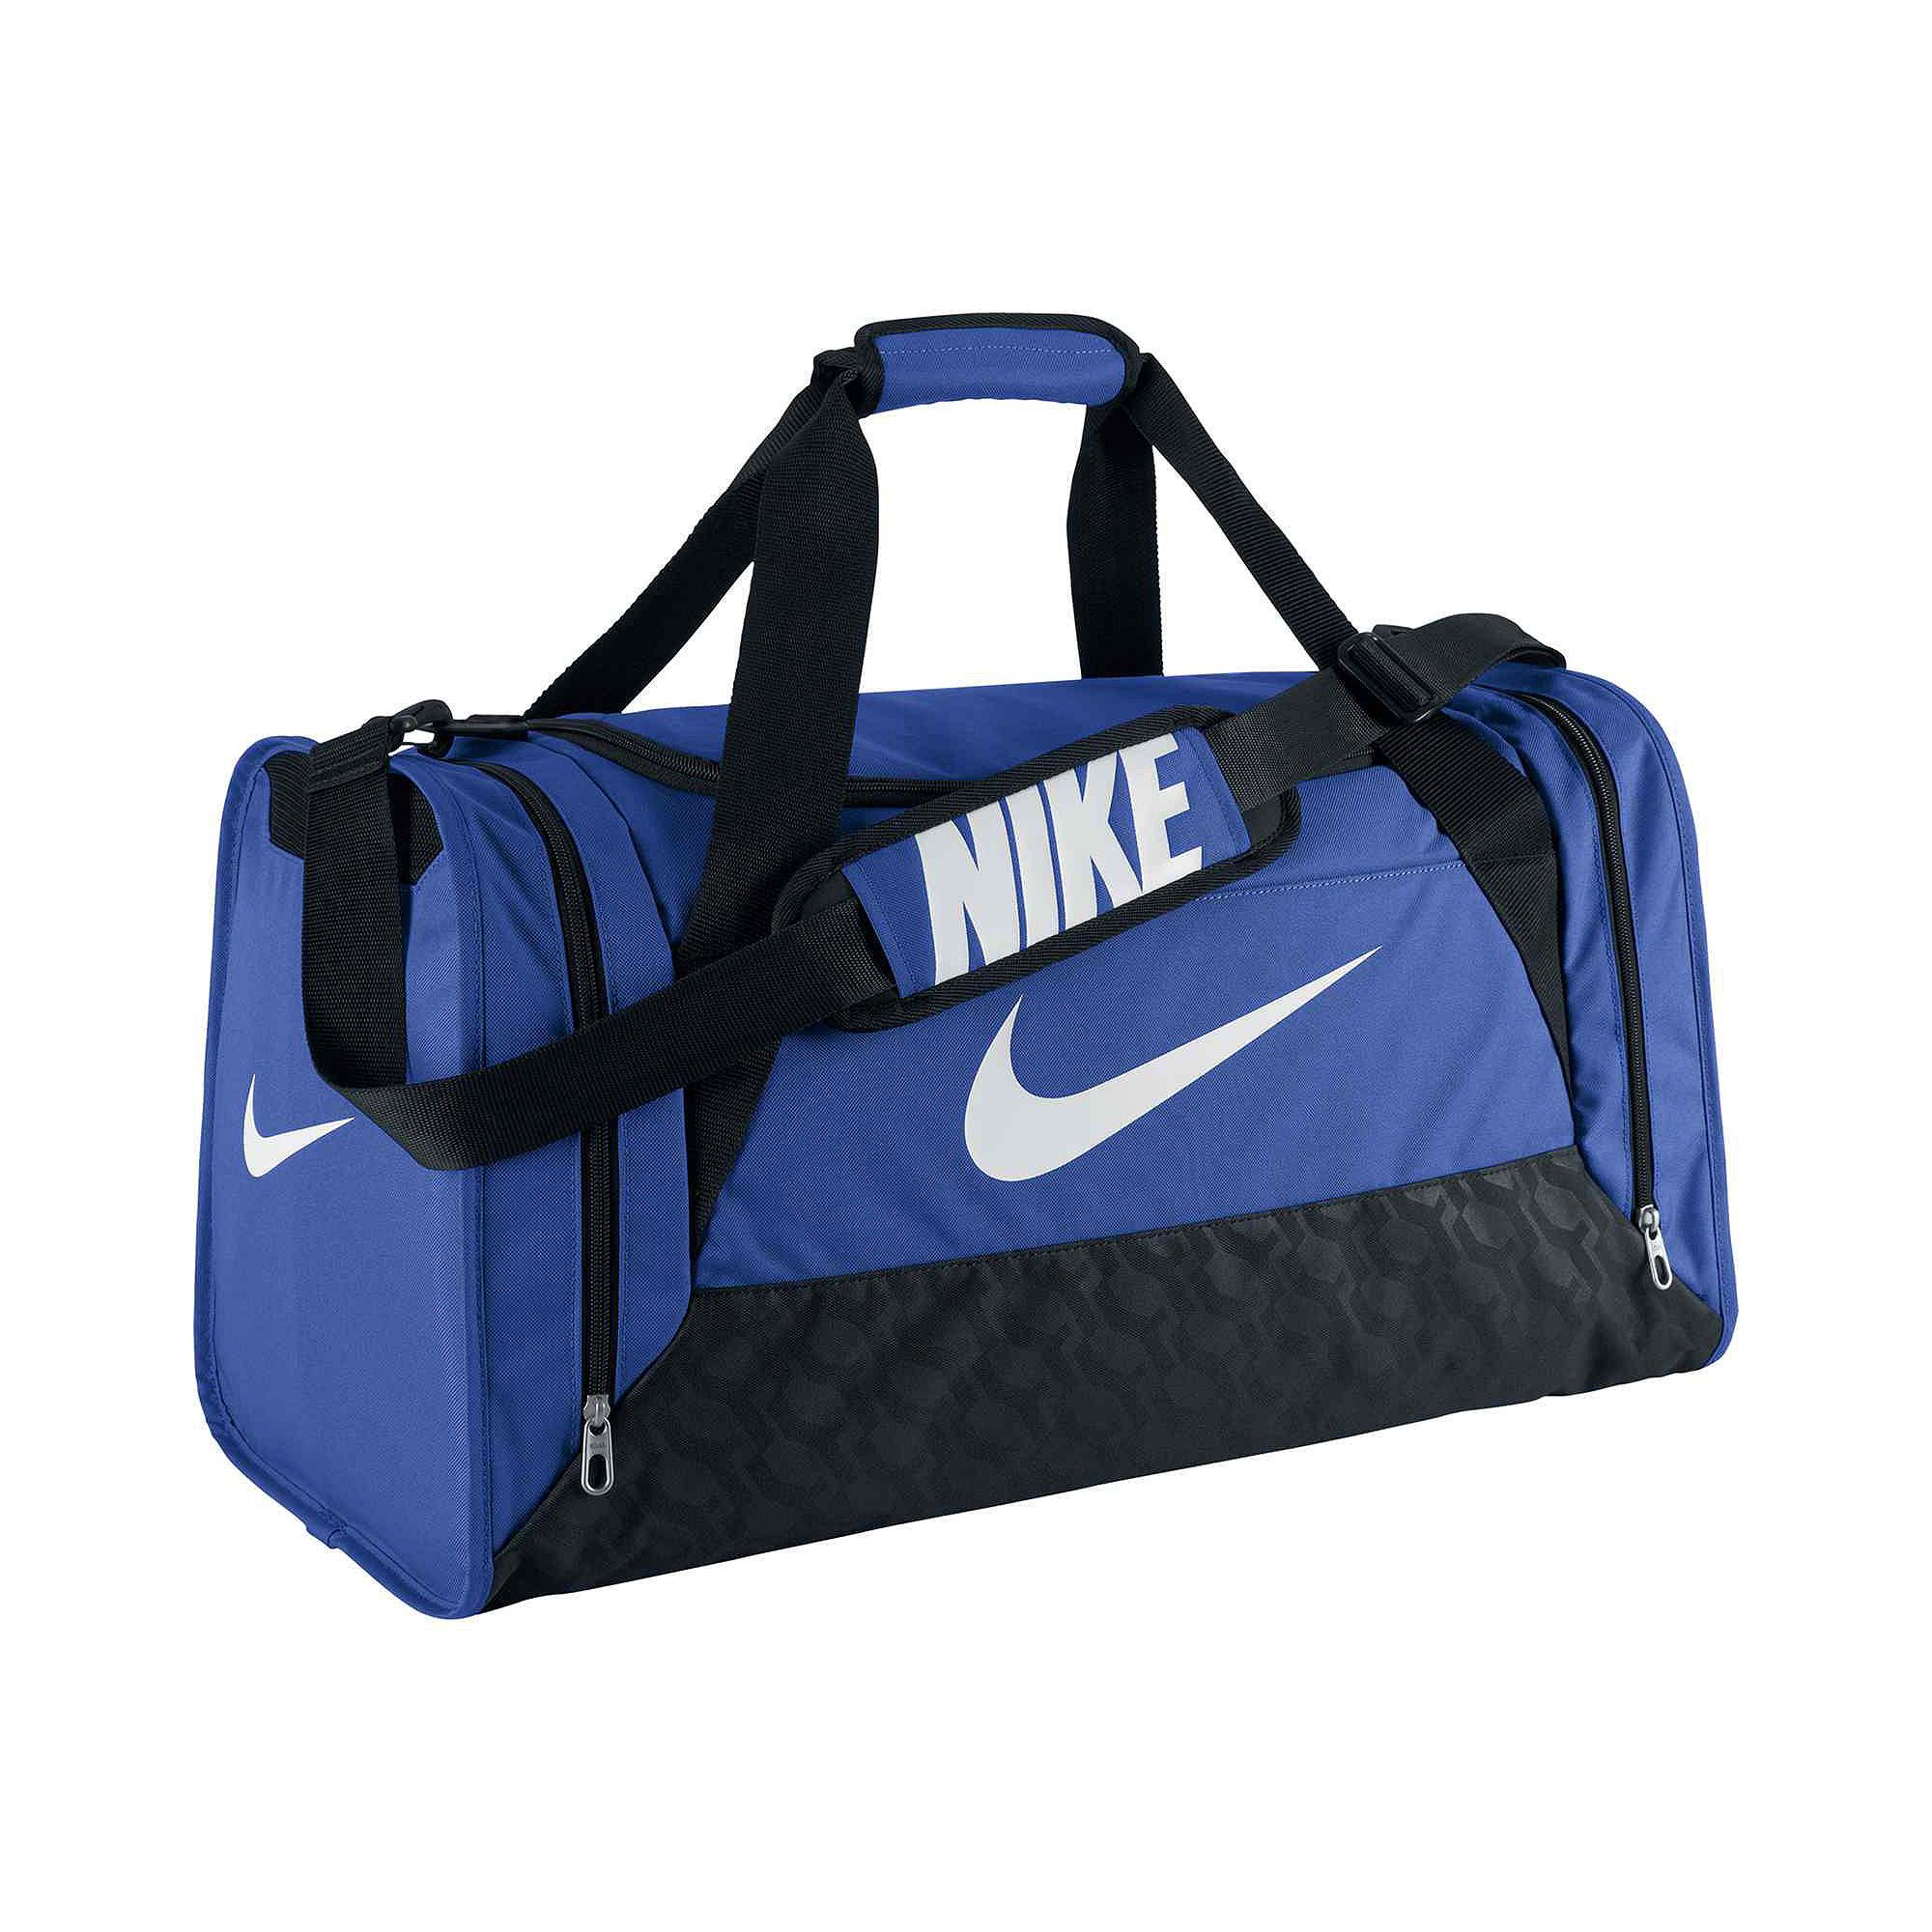 UPC 883153883559 - Nike Brasilia 6 Medium Duffel Bag  bc0fe1e50ee59